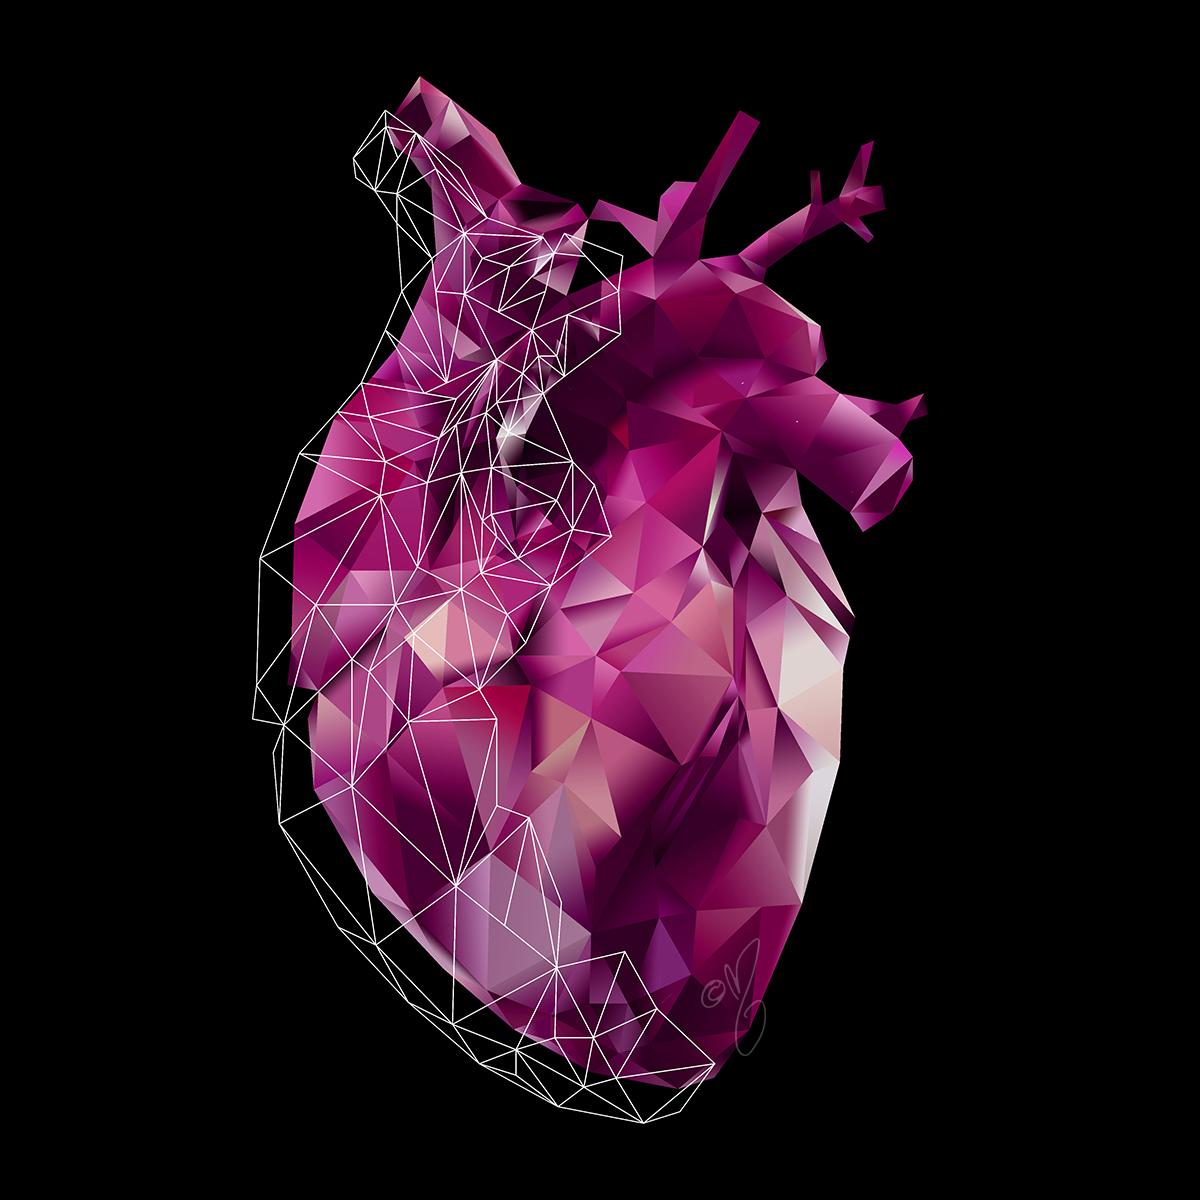 anatomy art // pink polygon heart